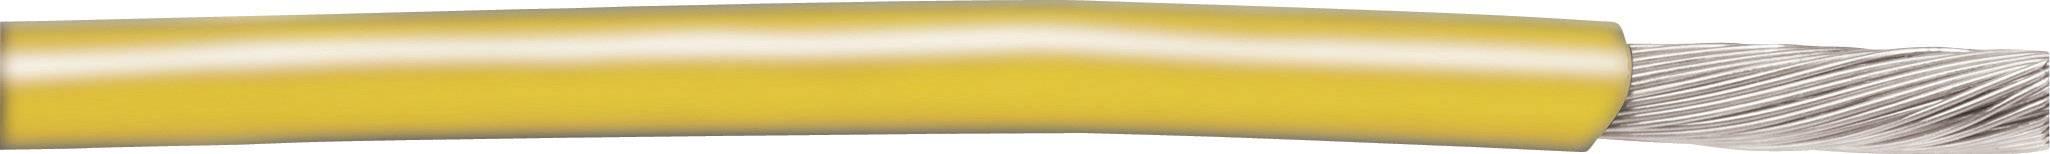 Pletenica EcoWire 1 x 0.32 mm, rumena AlphaWire 6713 30.5 m